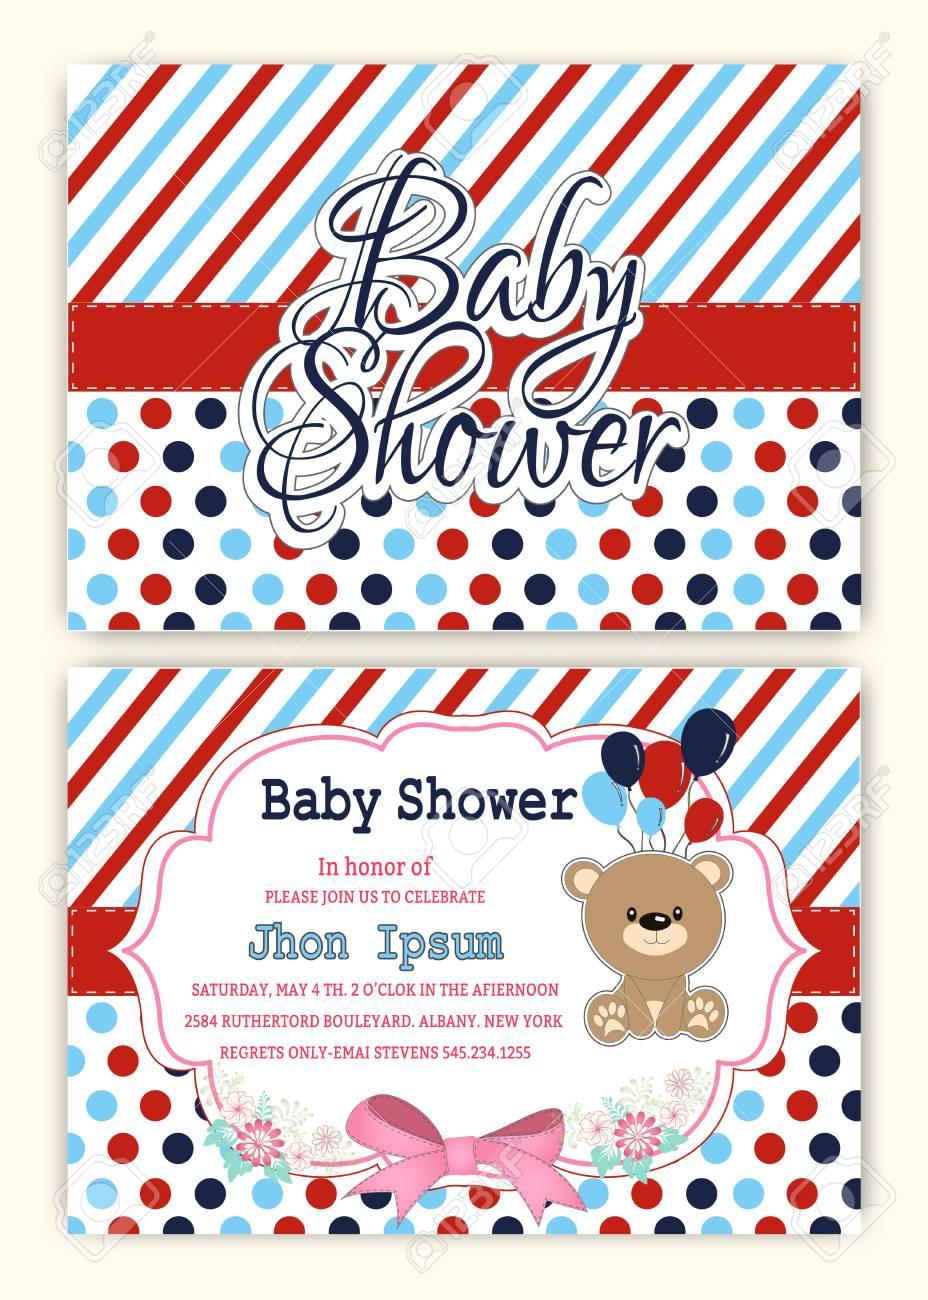 Baby Shower Party Invitation Design Template Ilustraciones